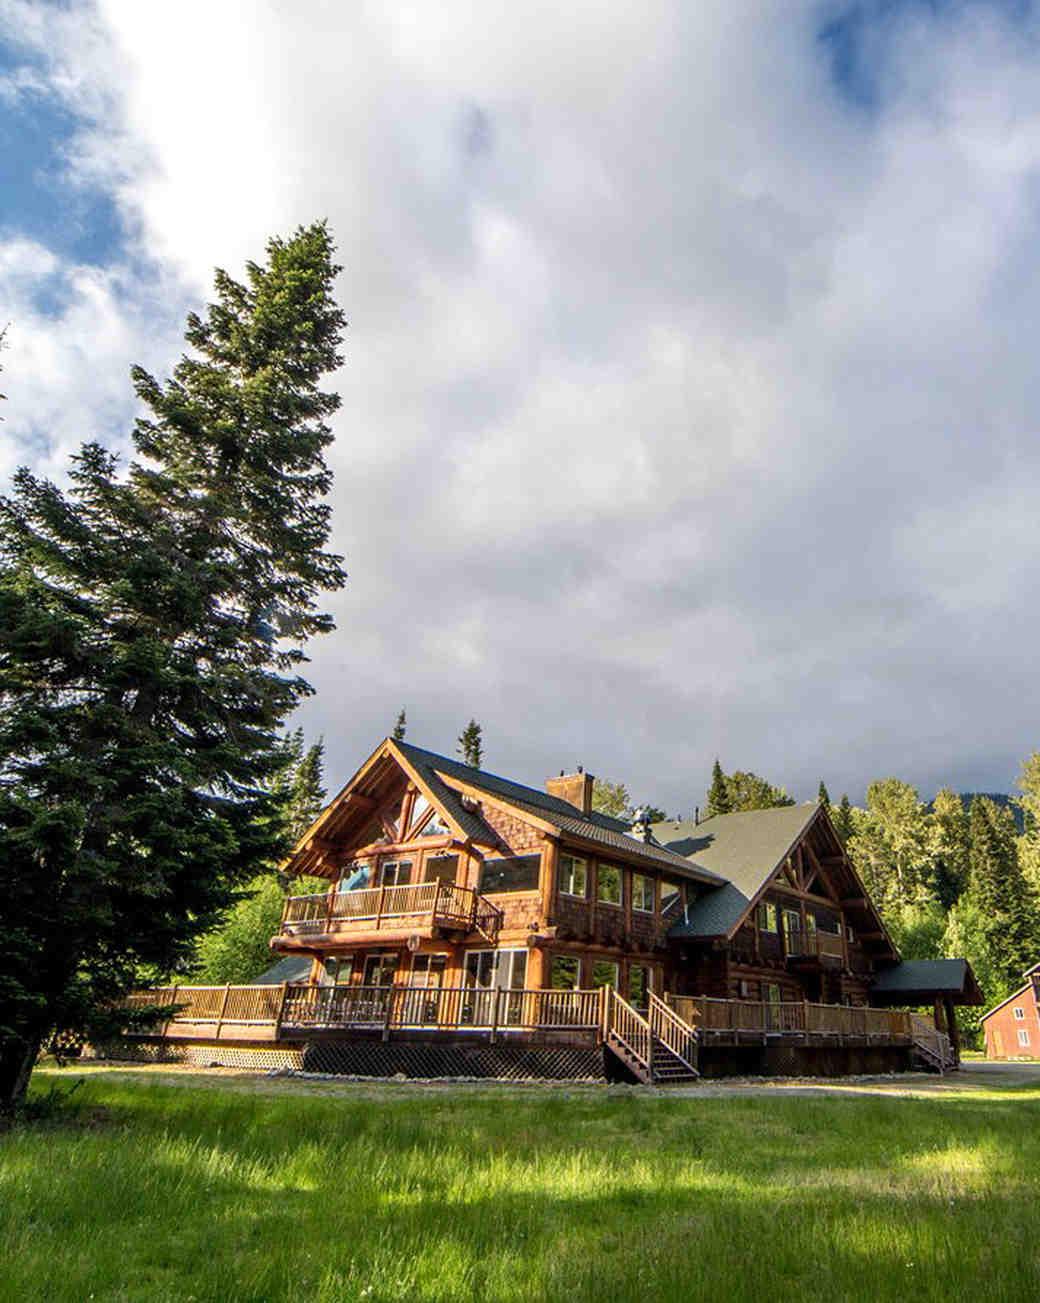 airbnb-wedding-venues-easton-washington-1218_vert.jpg